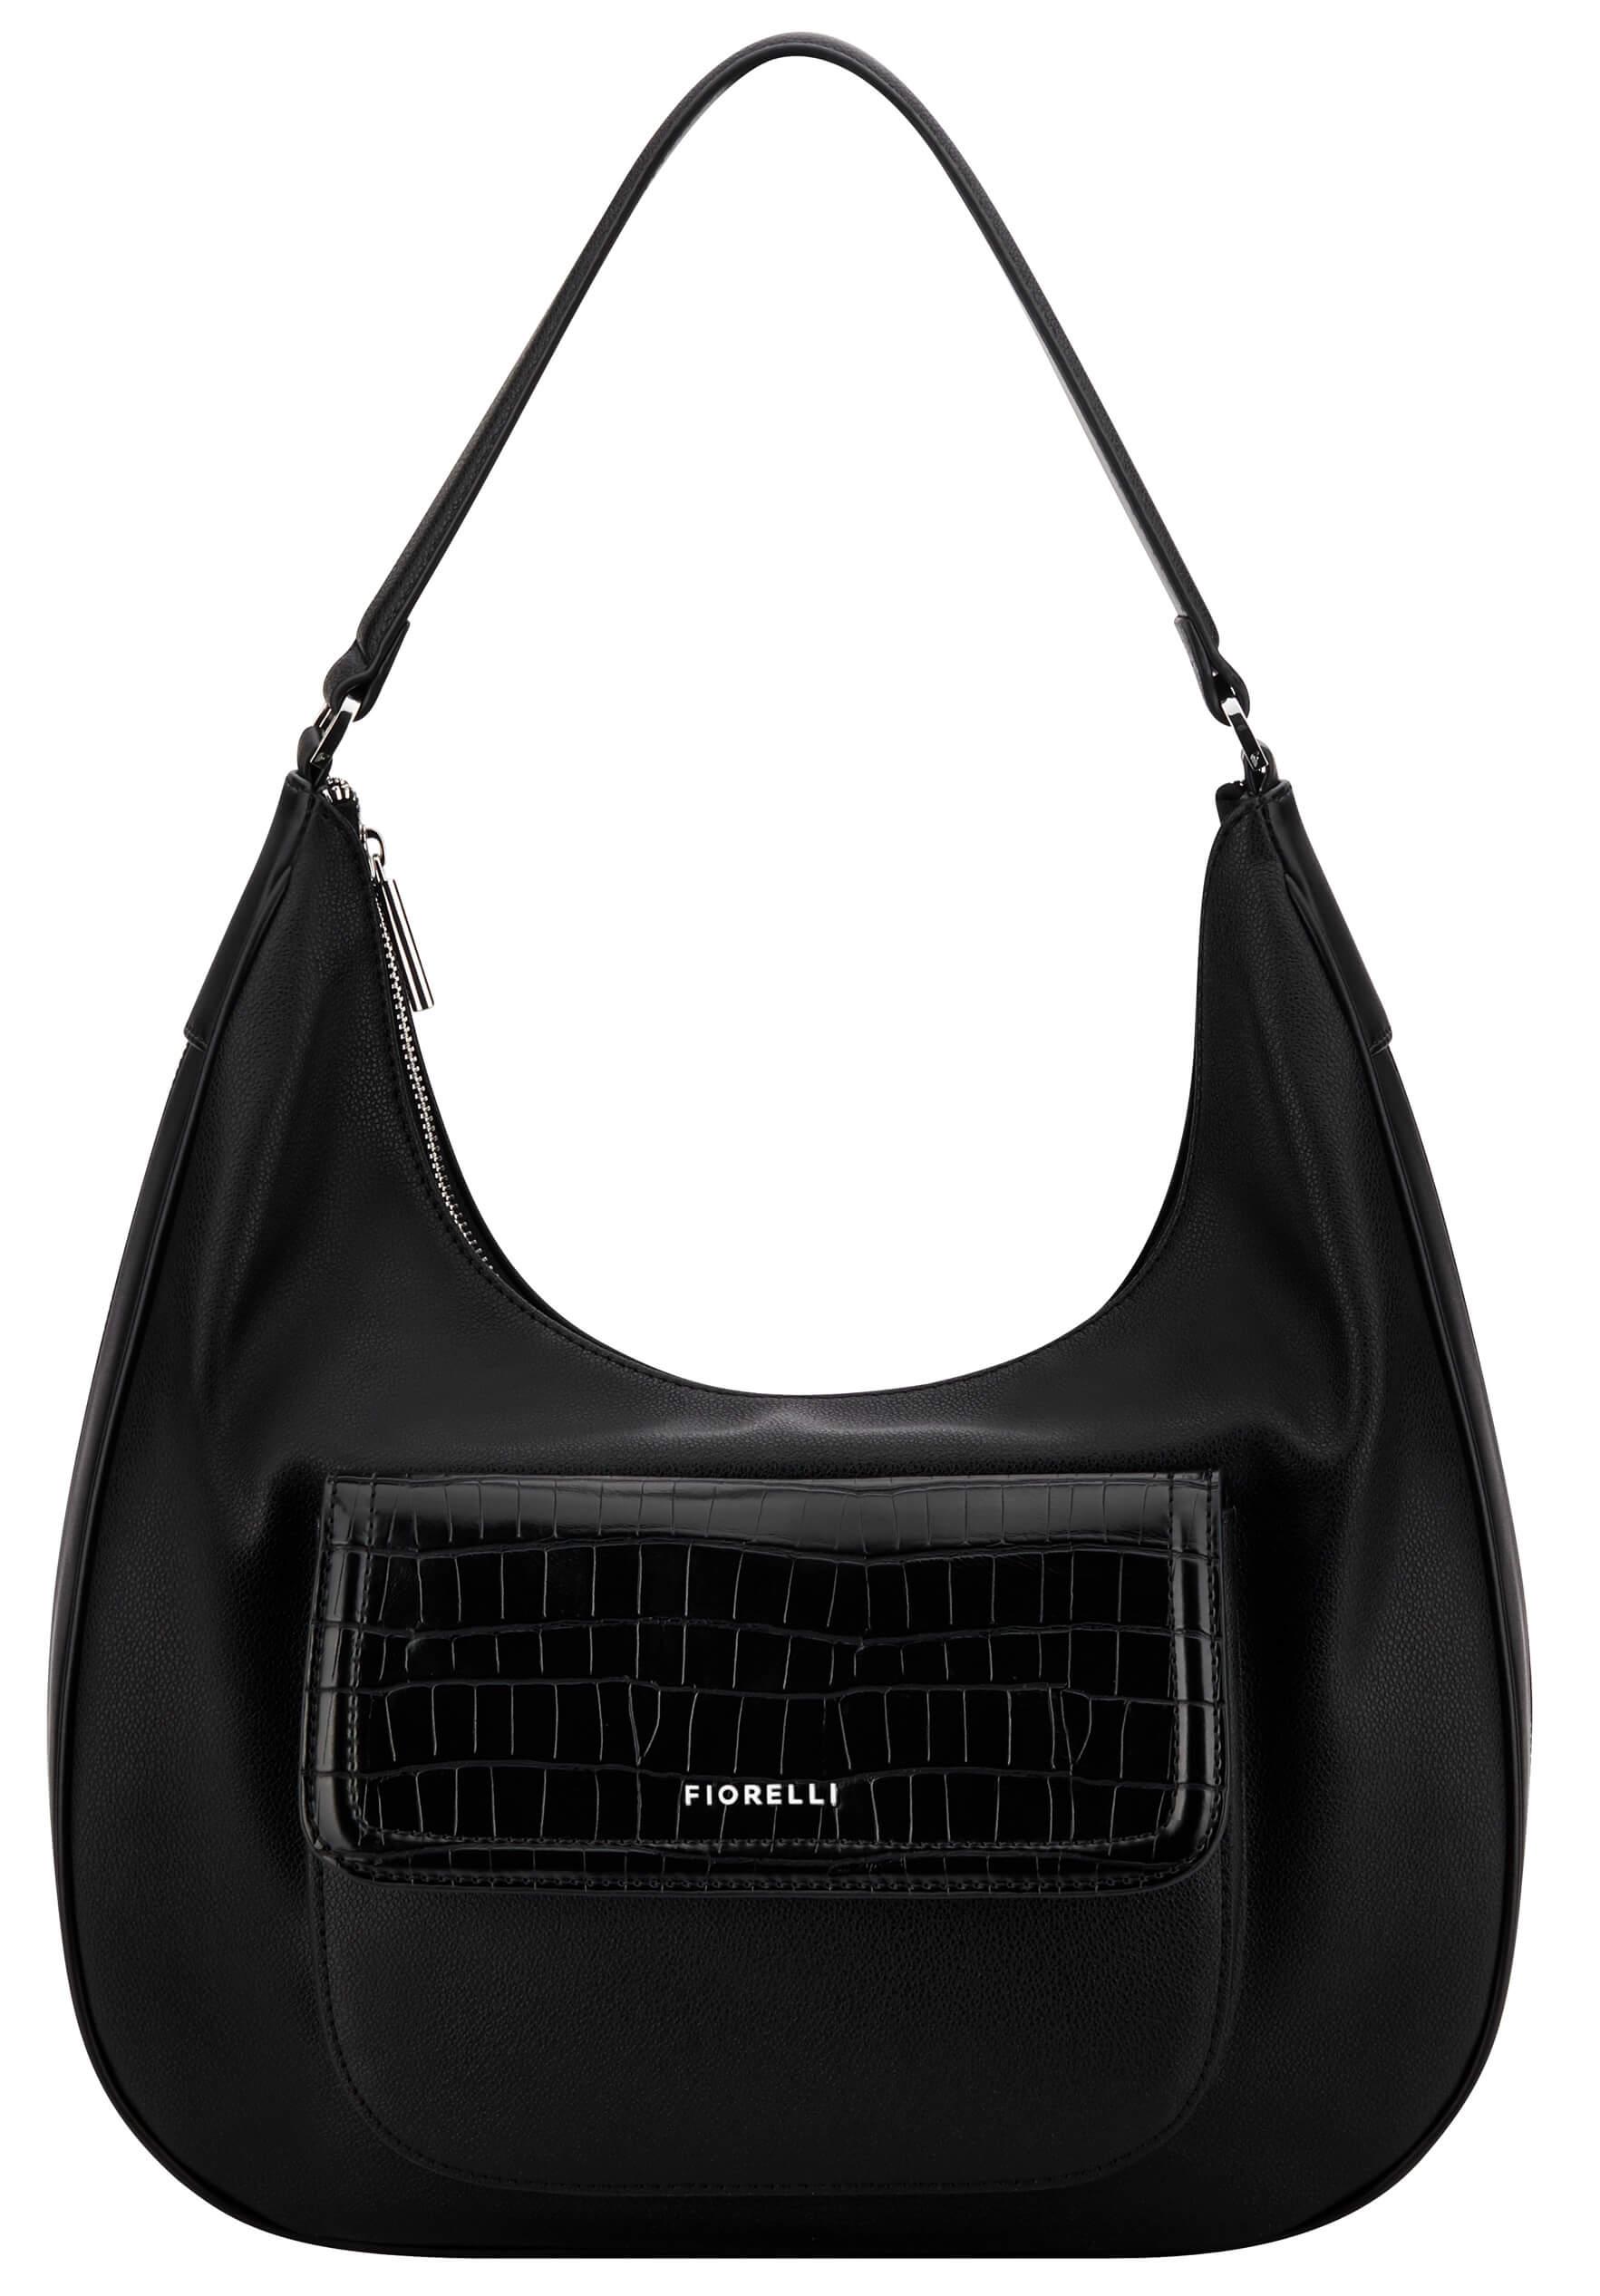 Fiorelli Dámská kabelka Tufnell FWH0440 Black Croc Doprava ZDARMA ... 0ce3ad38d6f